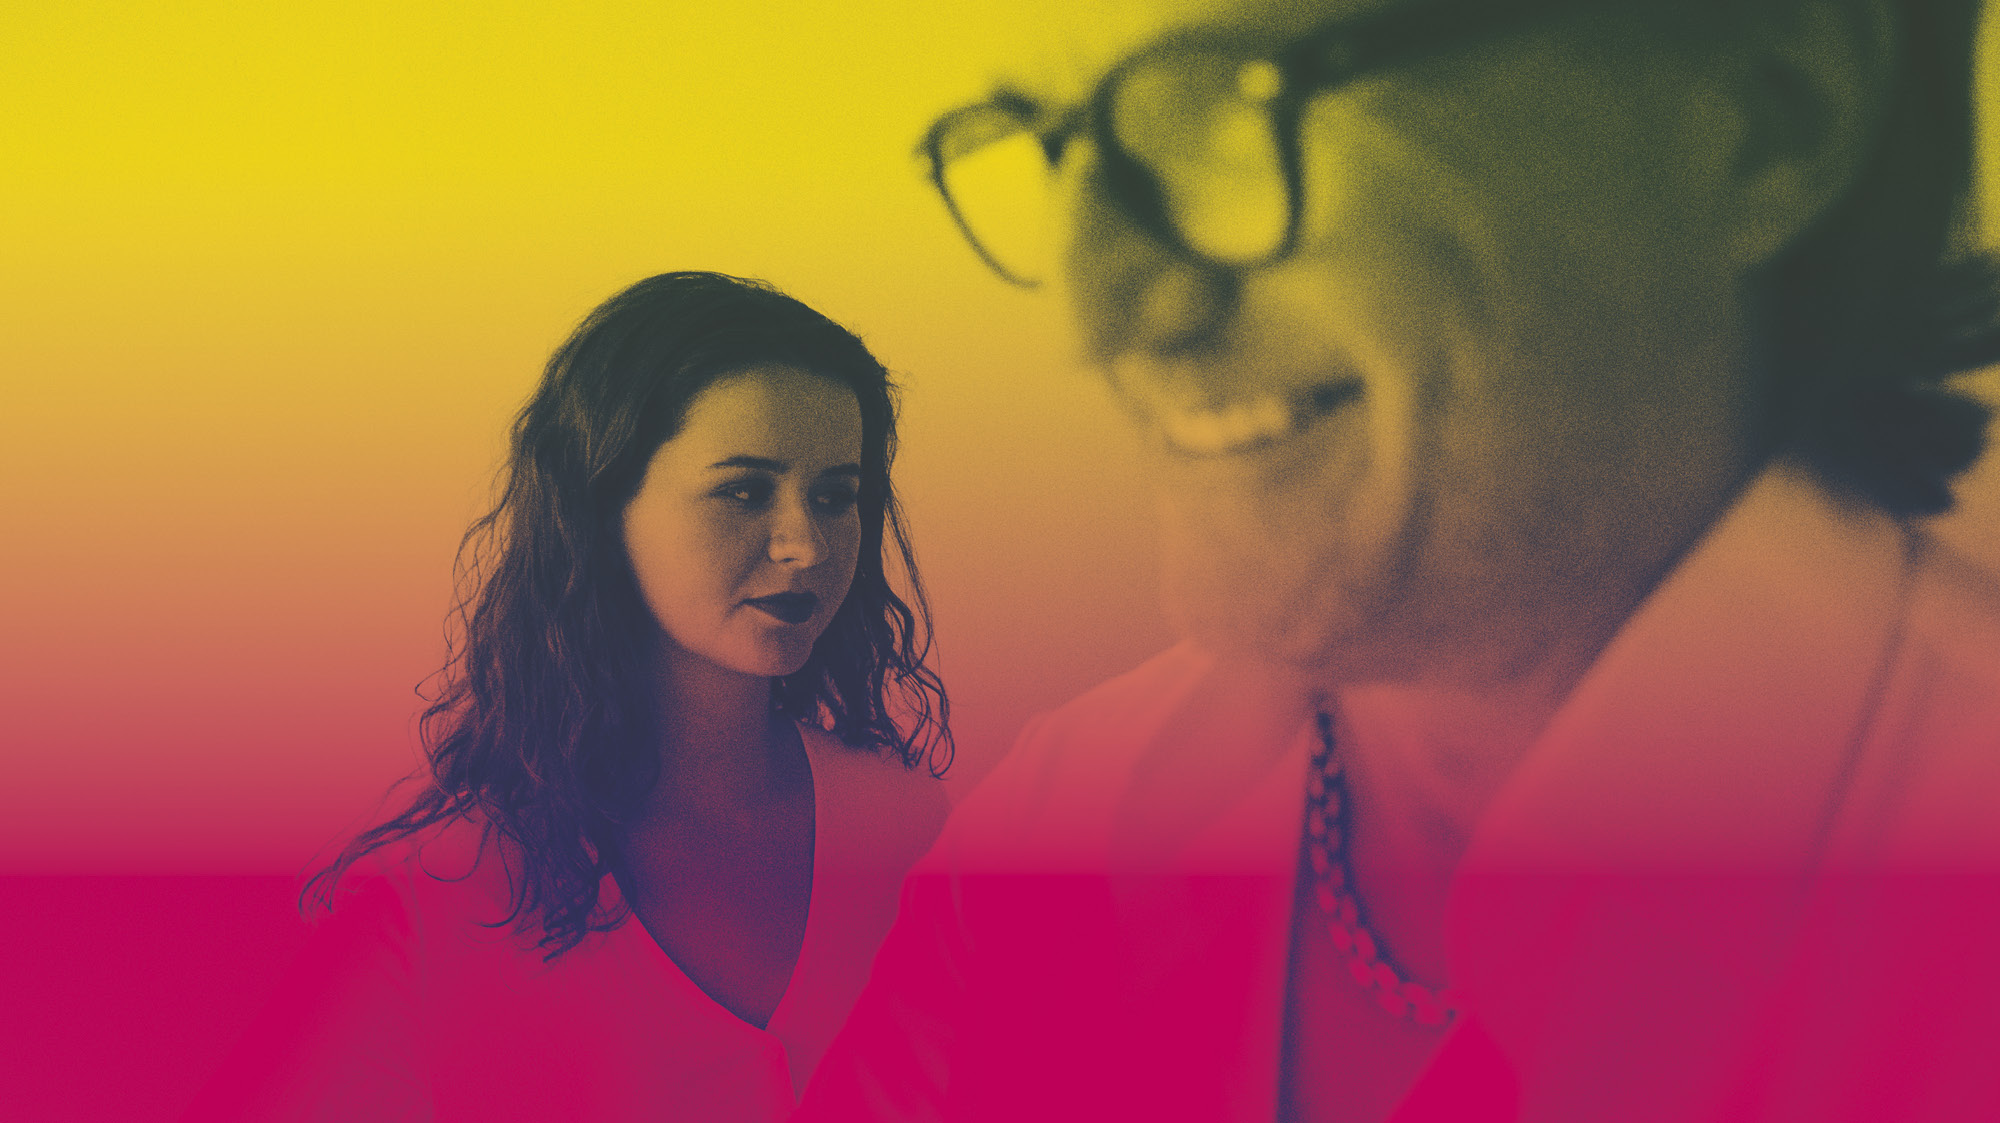 Anna Greta Sigurdadottir | Max Schultz